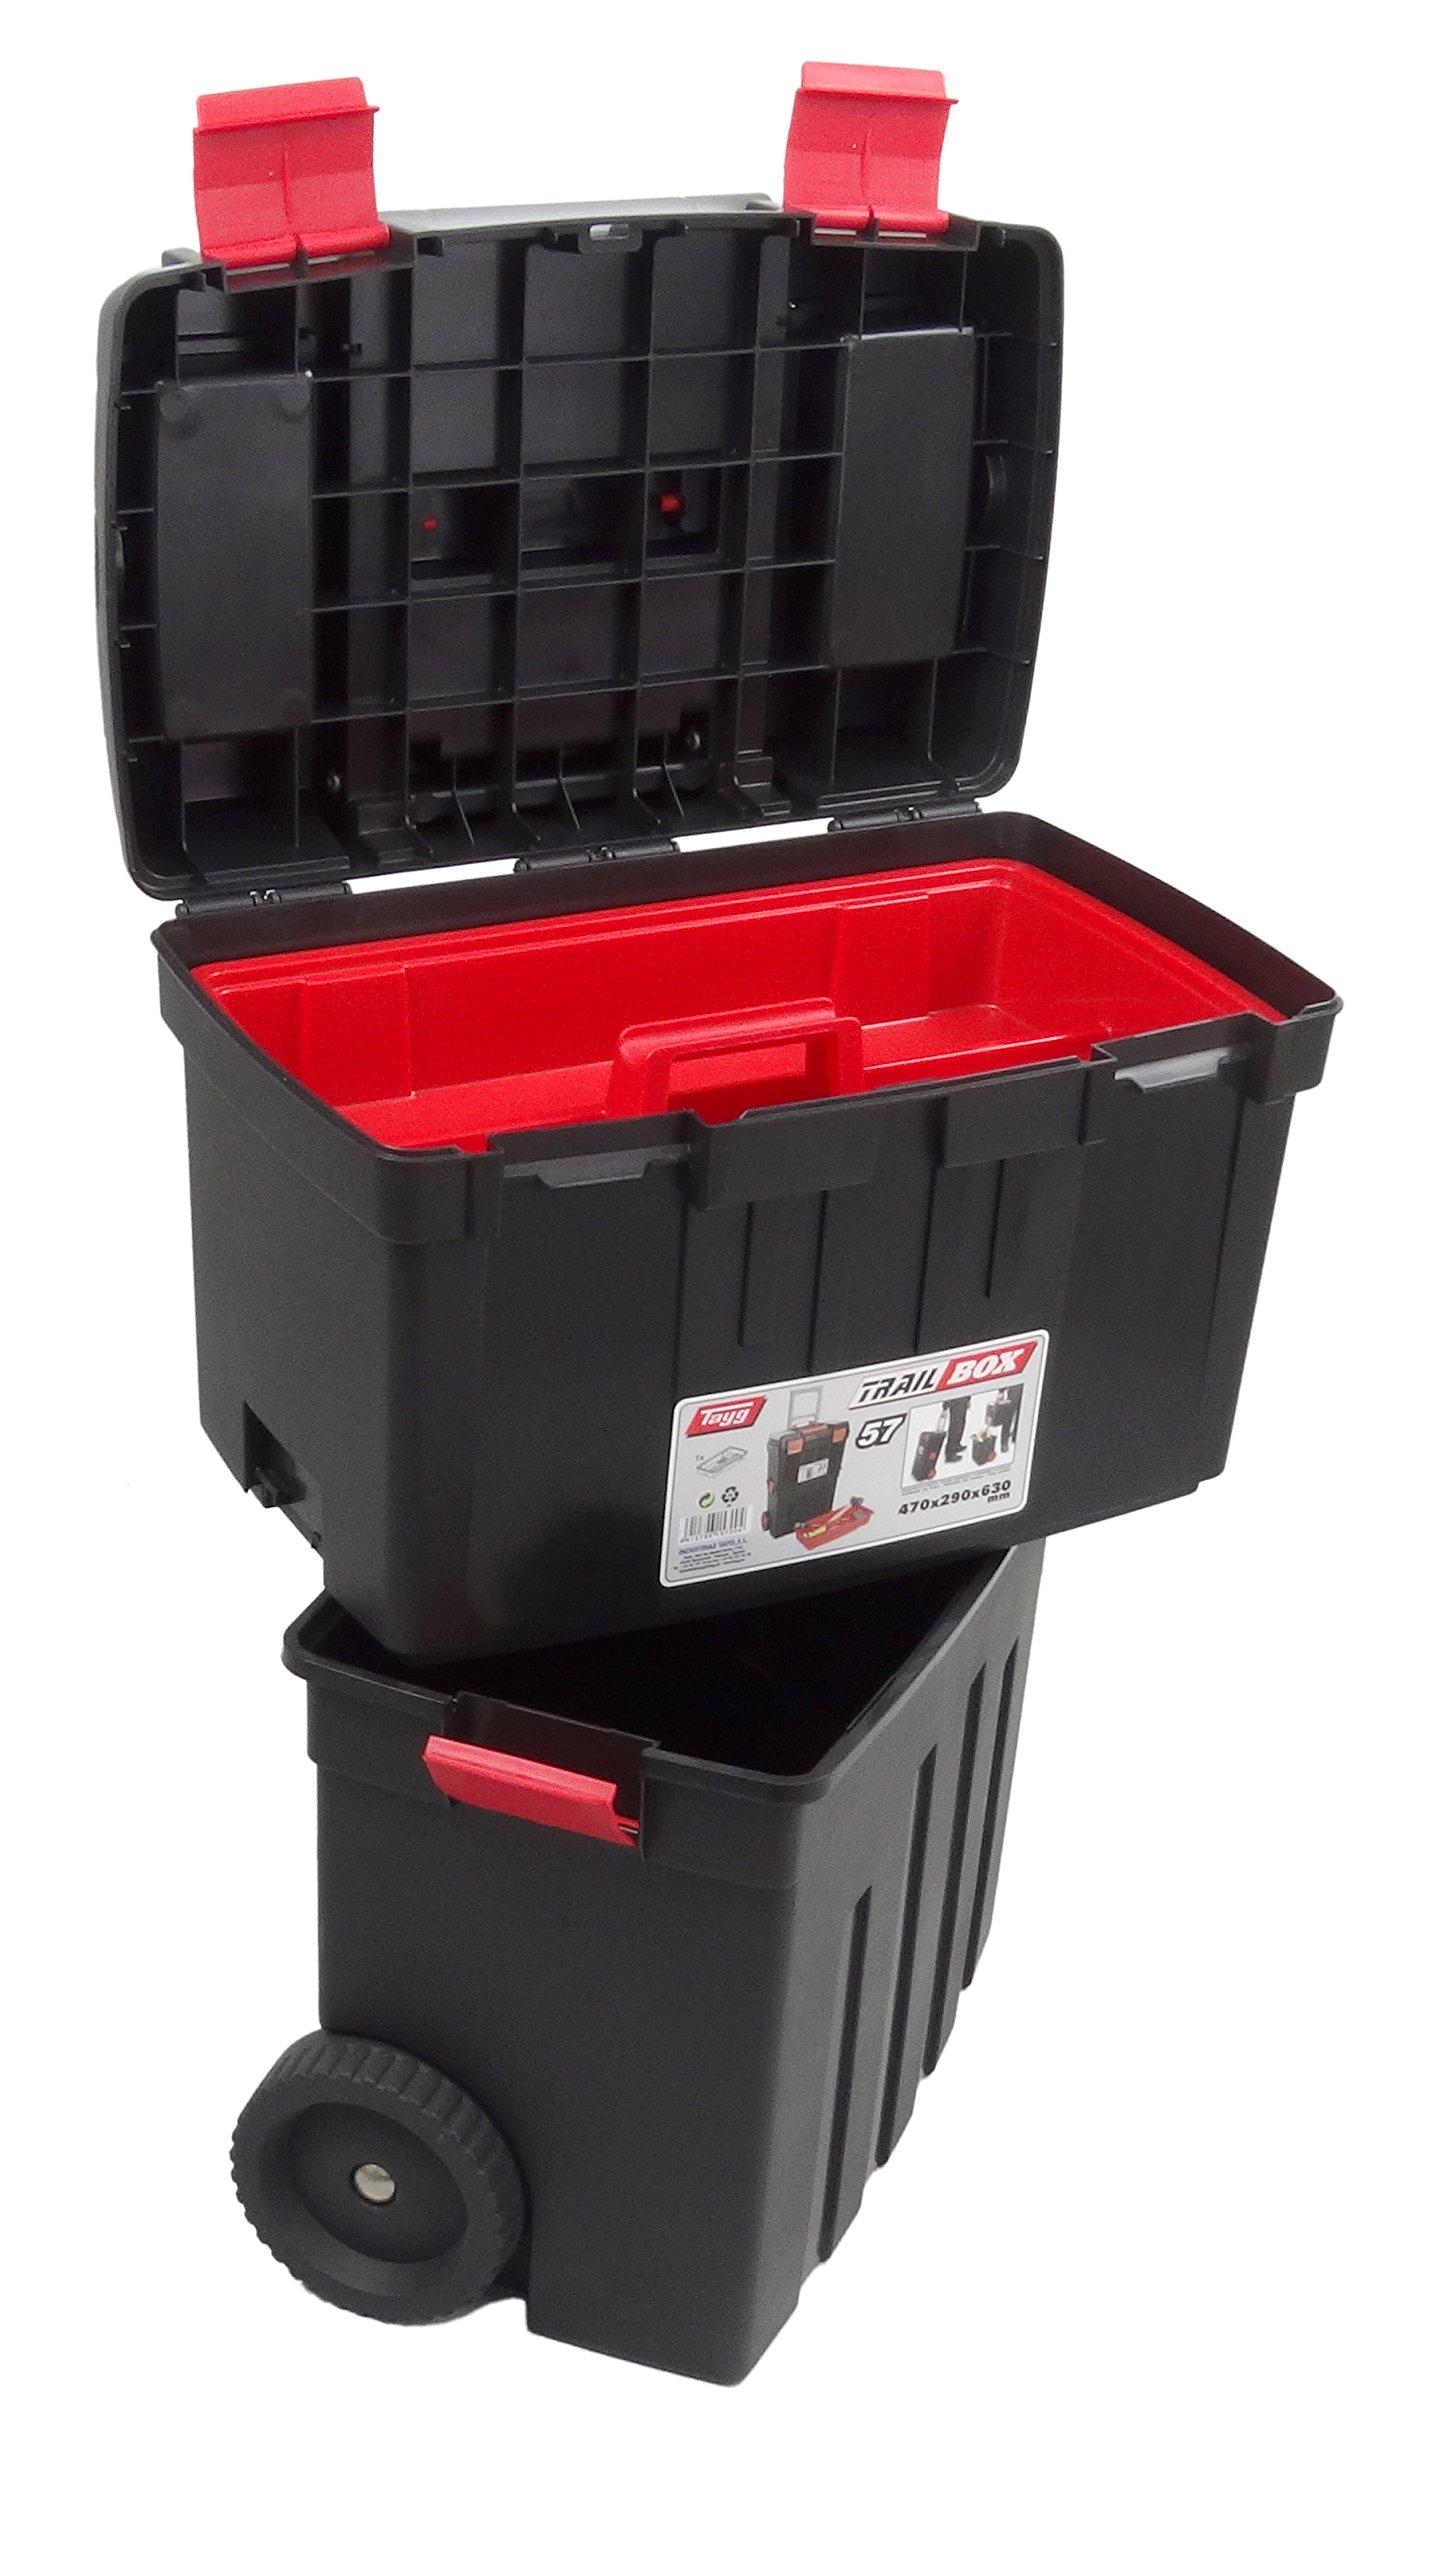 Tayg M255707 - Carro herramientas trail box profesional n.57 ...